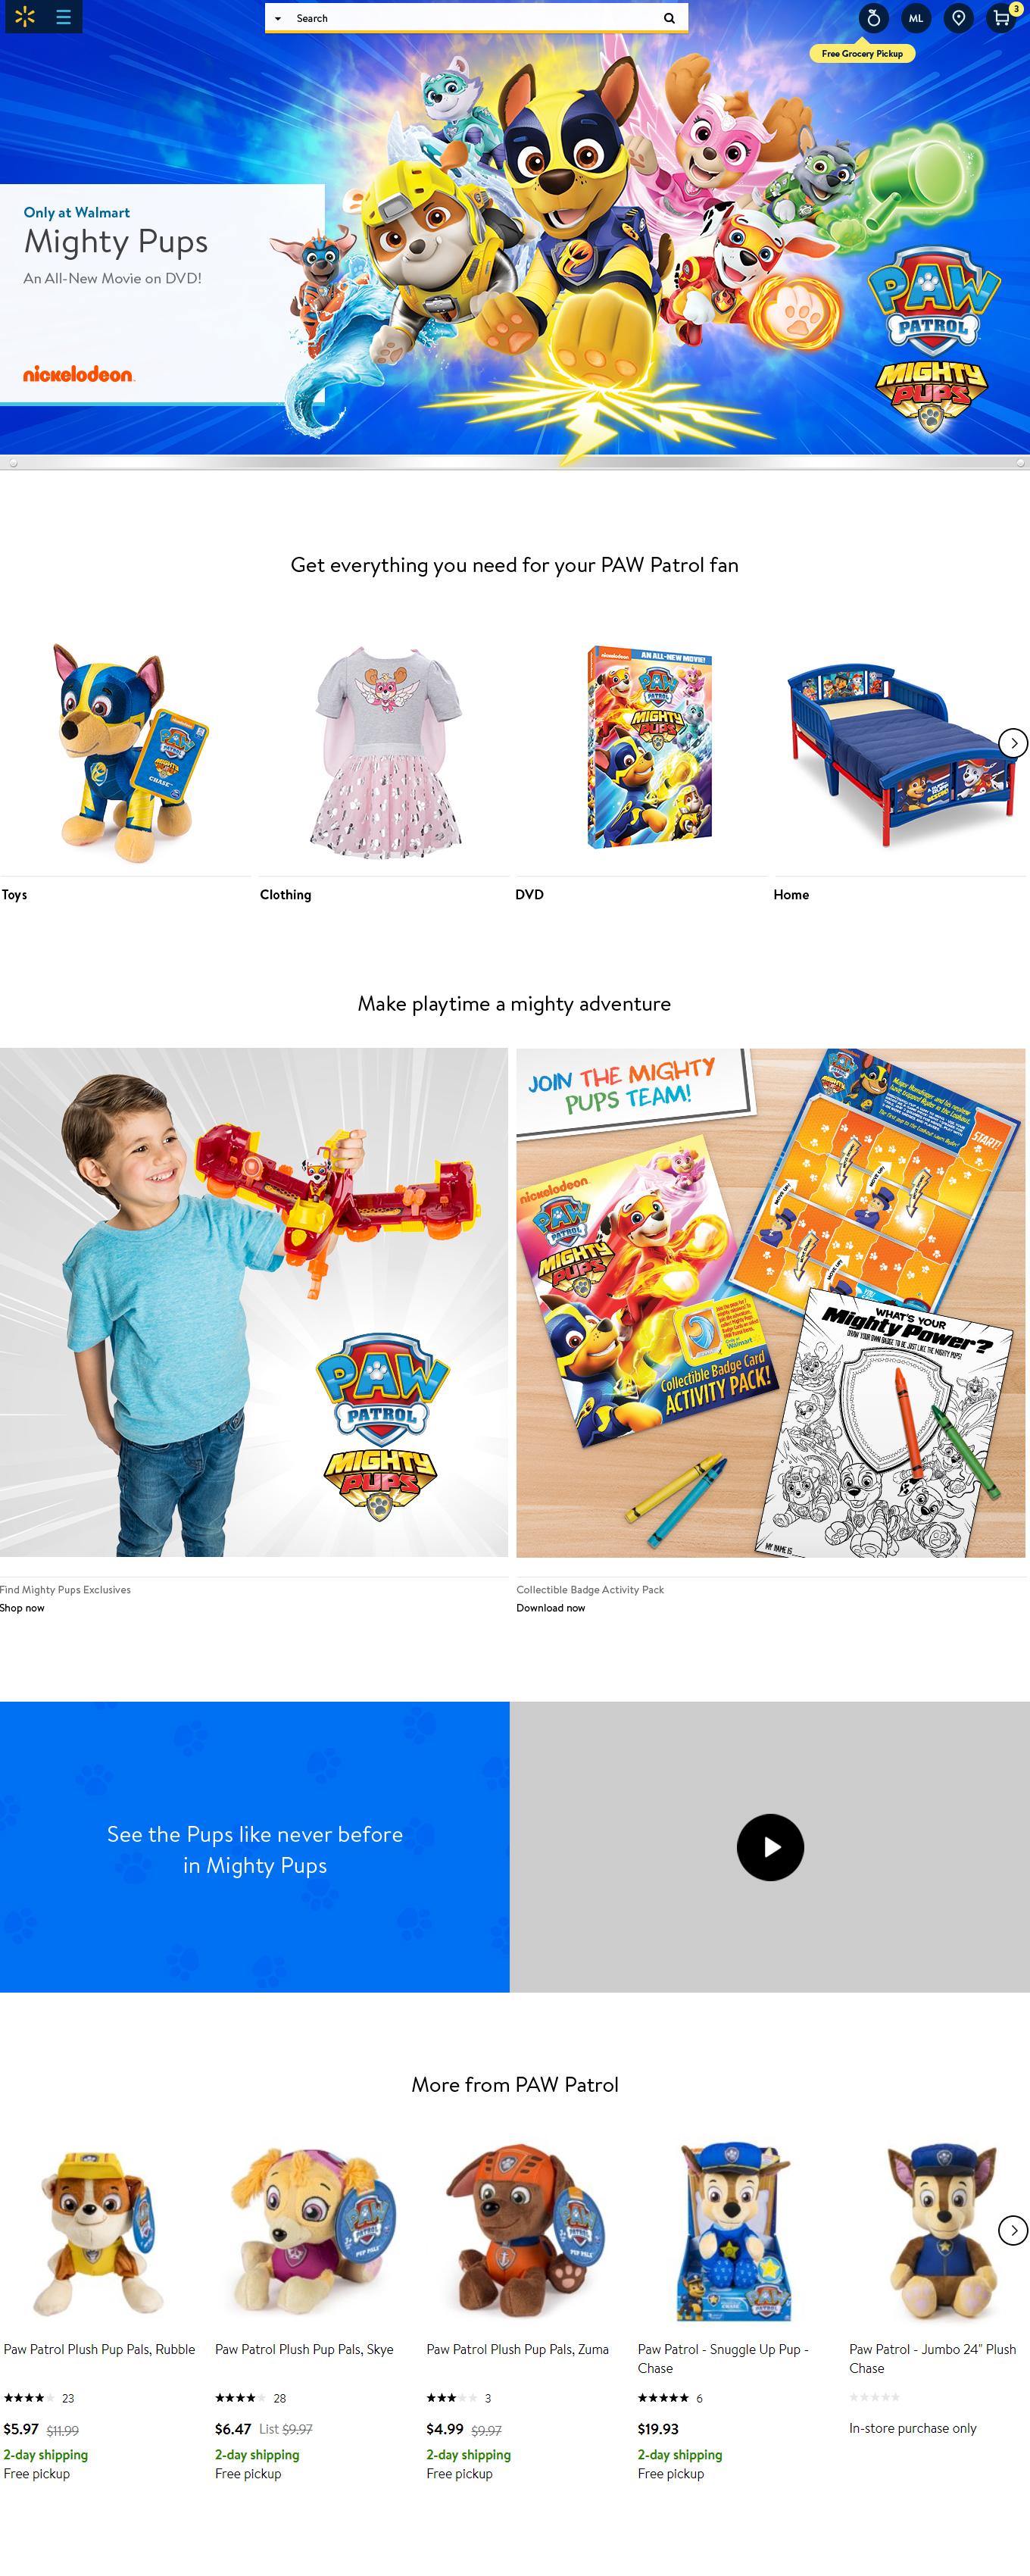 01_NCK_P1563_MightyPups_BrandPage_desktop.jpg